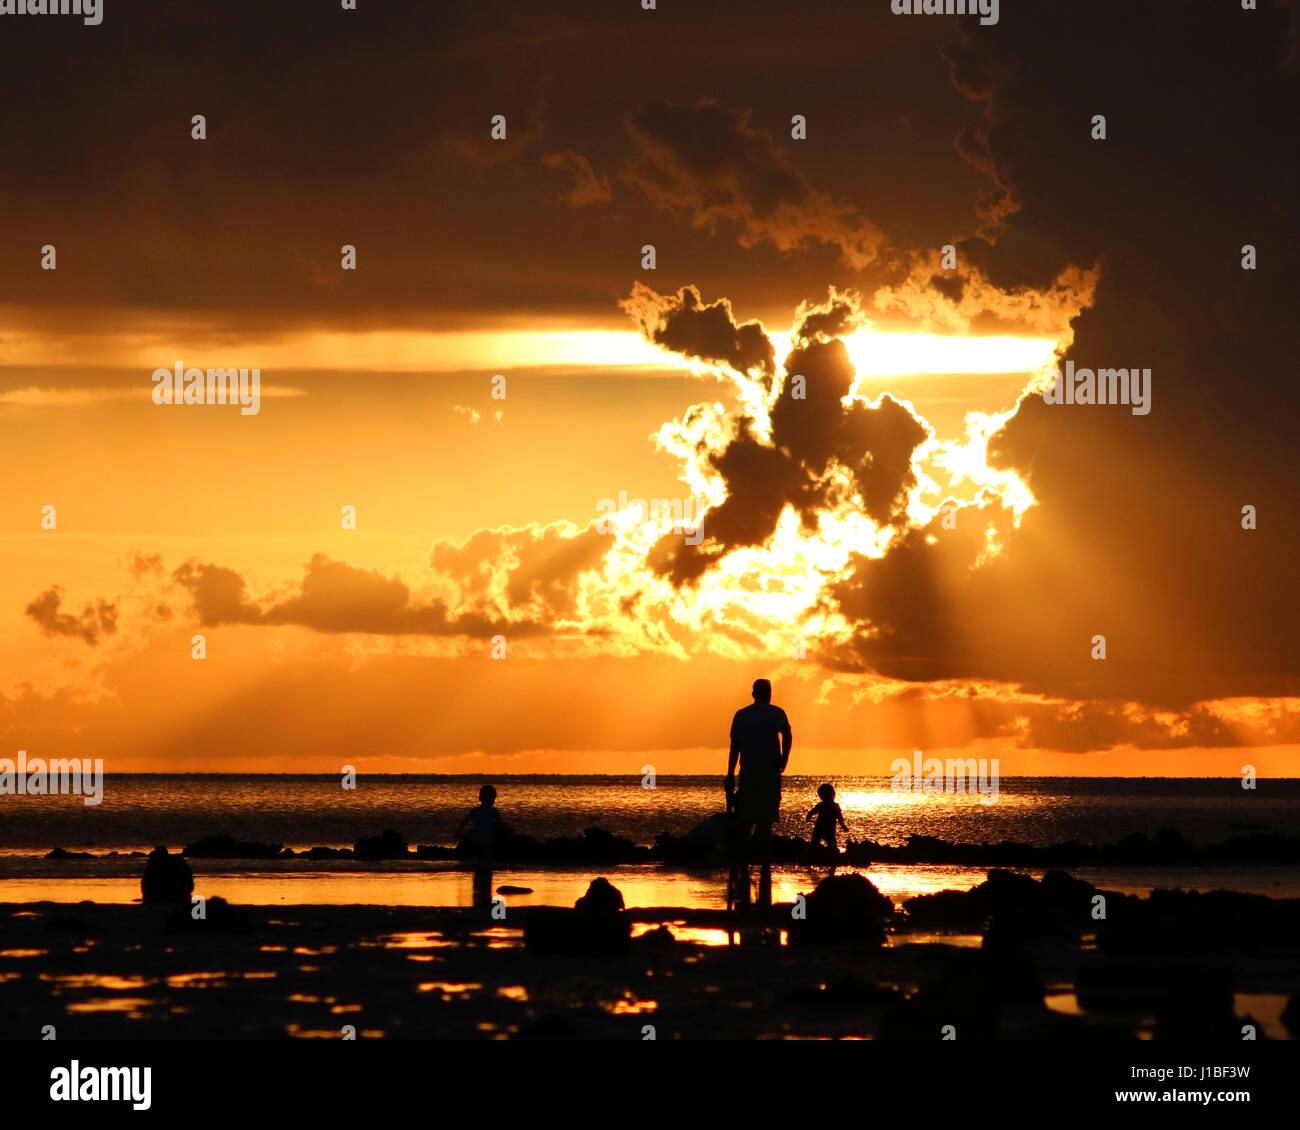 Family time Florida sunset - Stock Image